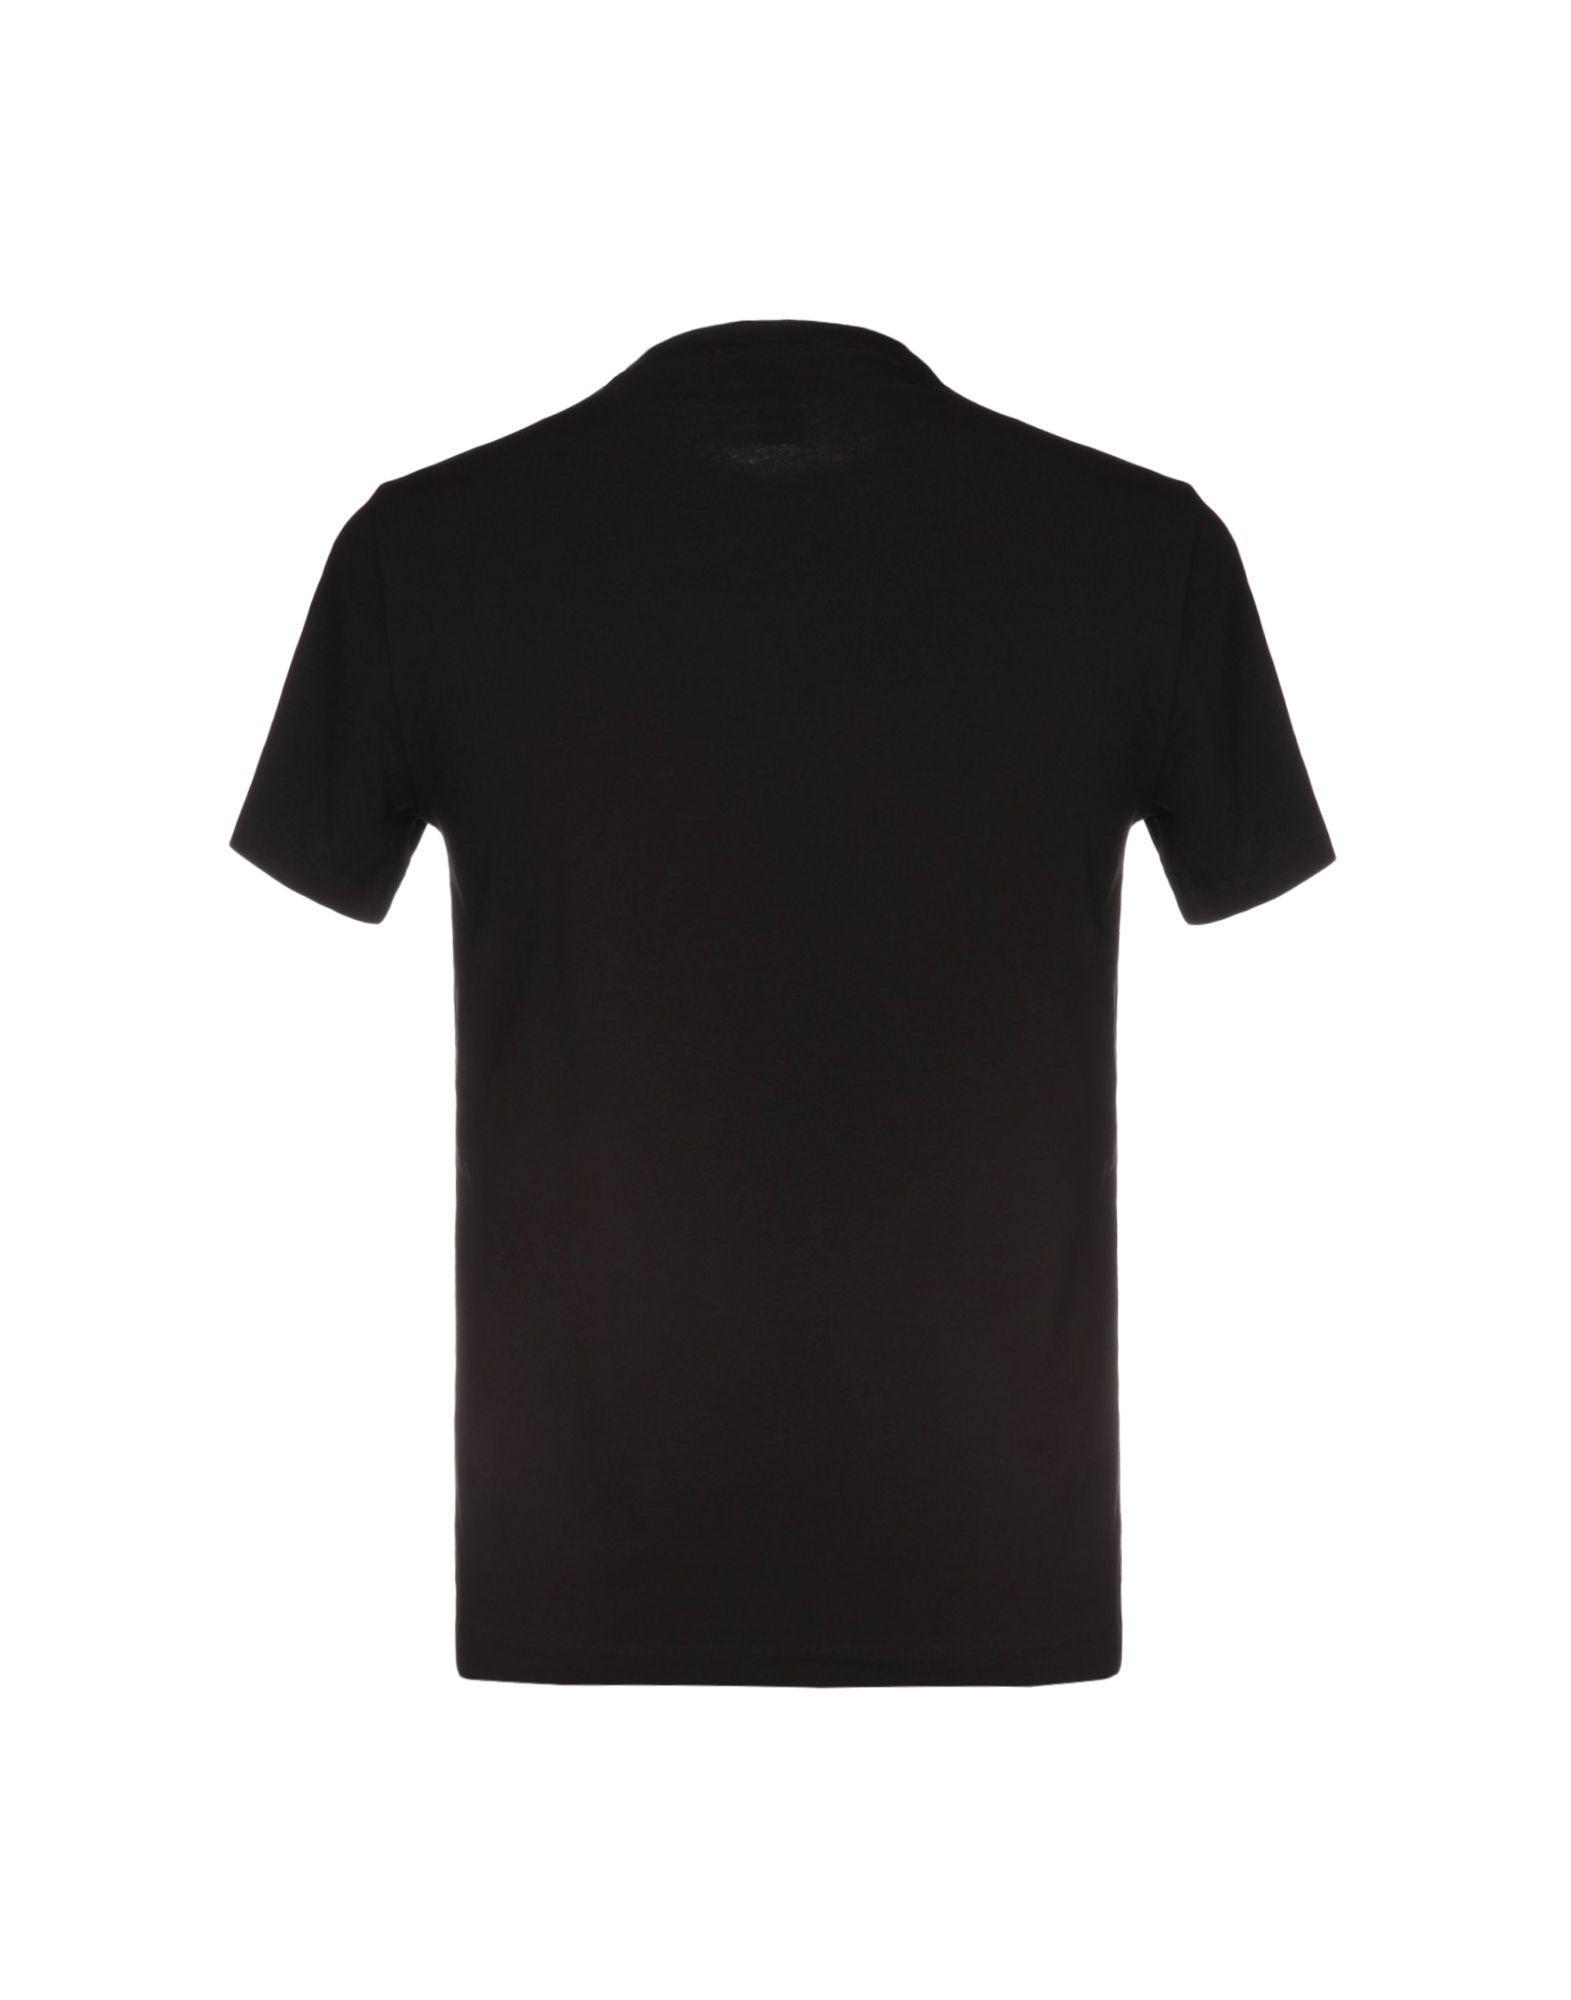 12ef56573 Class Roberto Cavalli T-shirt in Black for Men - Save 20% - Lyst